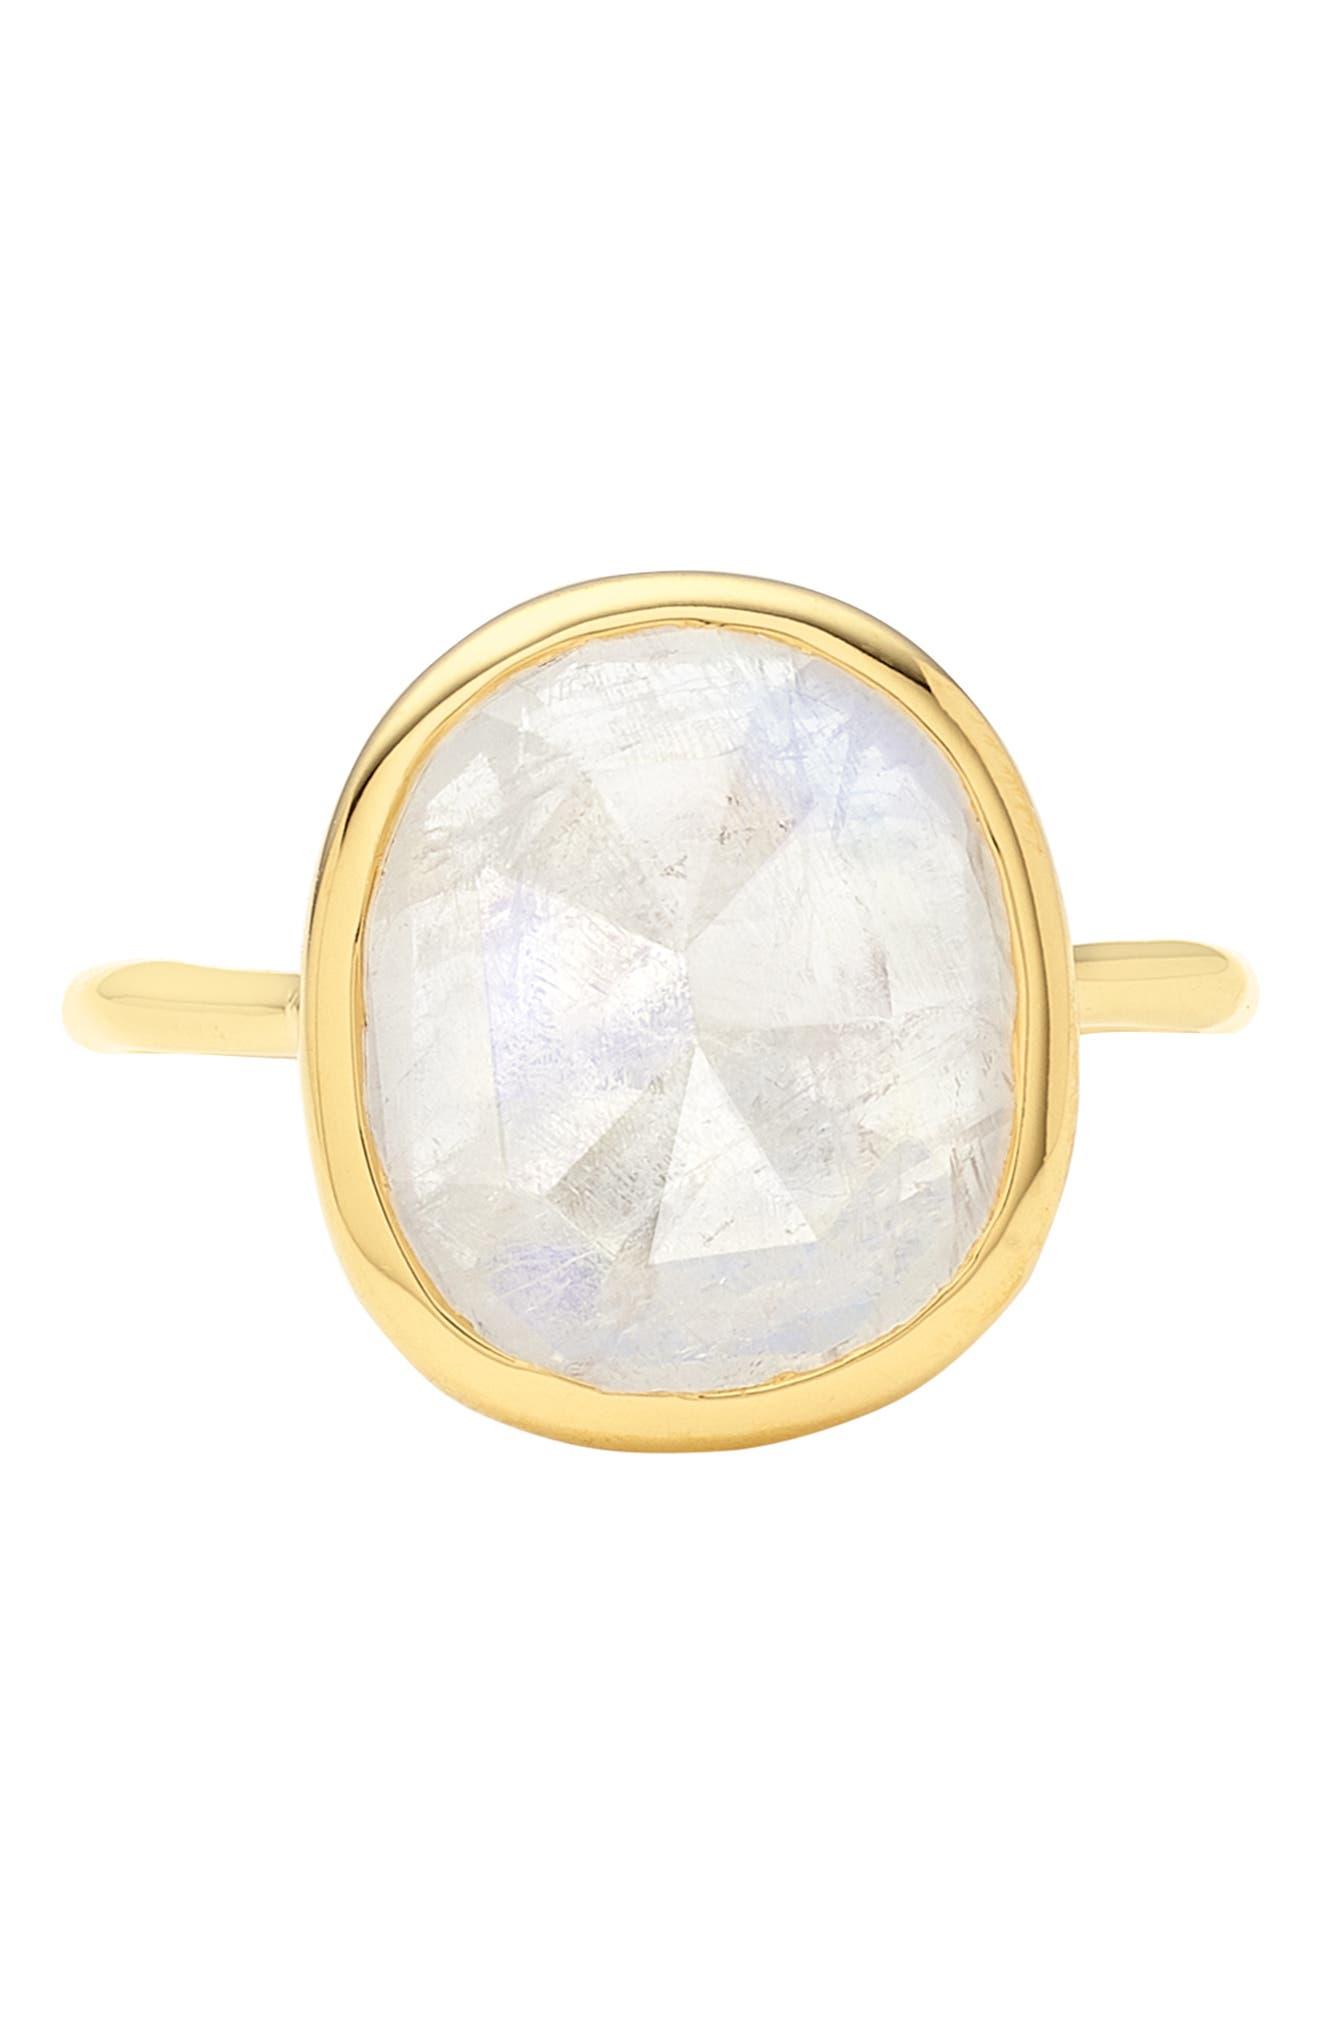 MONICA VINADER, Siren Semiprecious Stone Ring, Alternate thumbnail 4, color, GOLD/ MOONSTONE